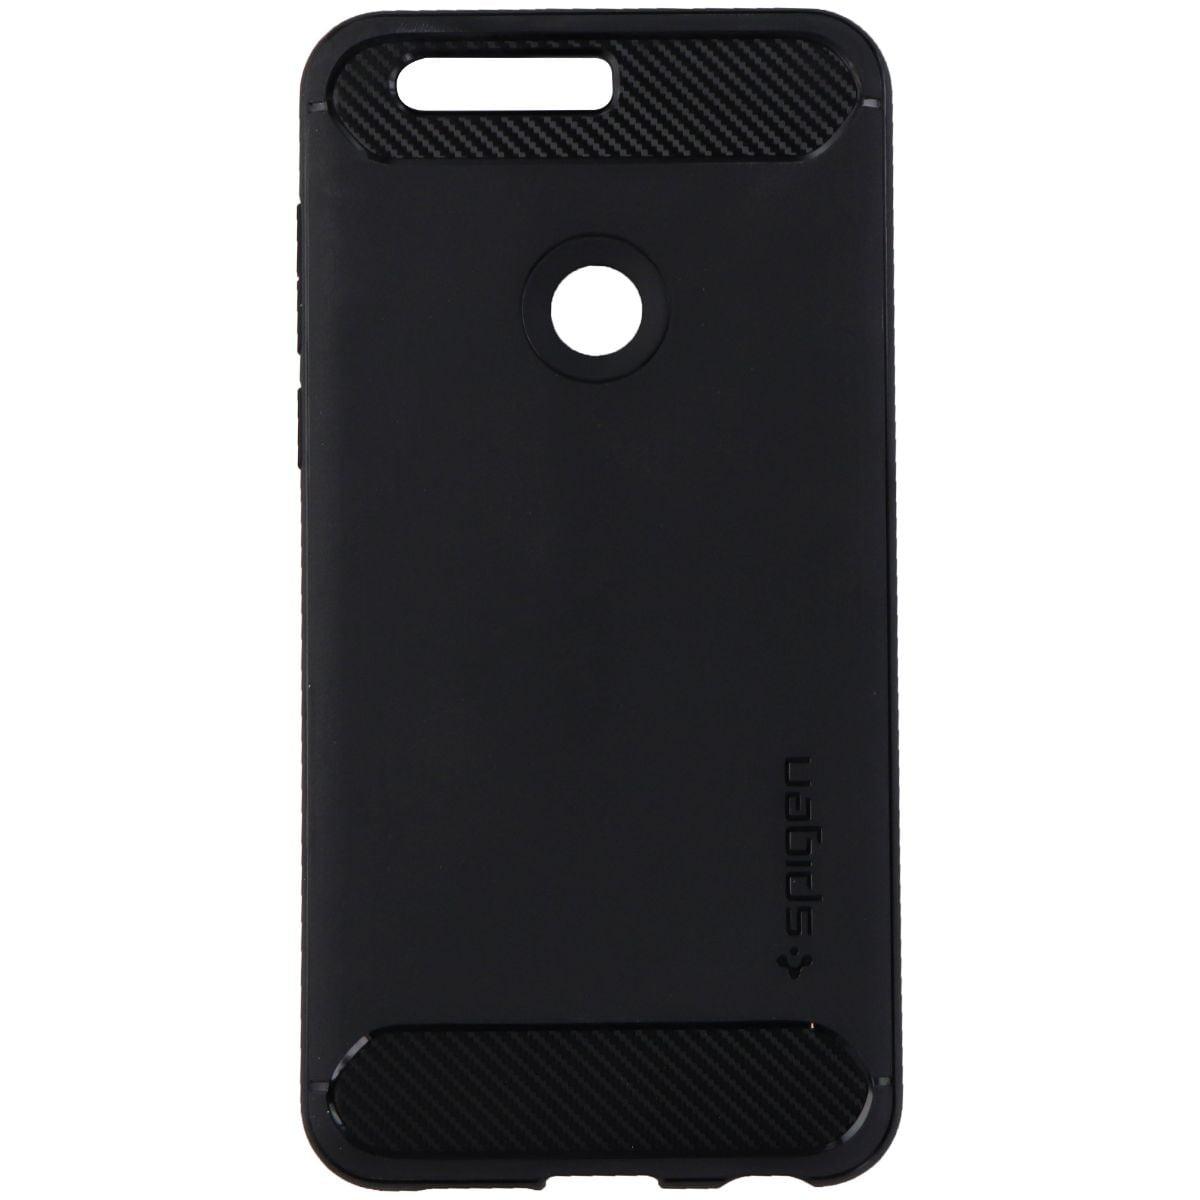 Spigen (L09CS20884) Rugged Armor Phone Case for Huawei Honor 8 Smartphone- Black - image 1 of 1